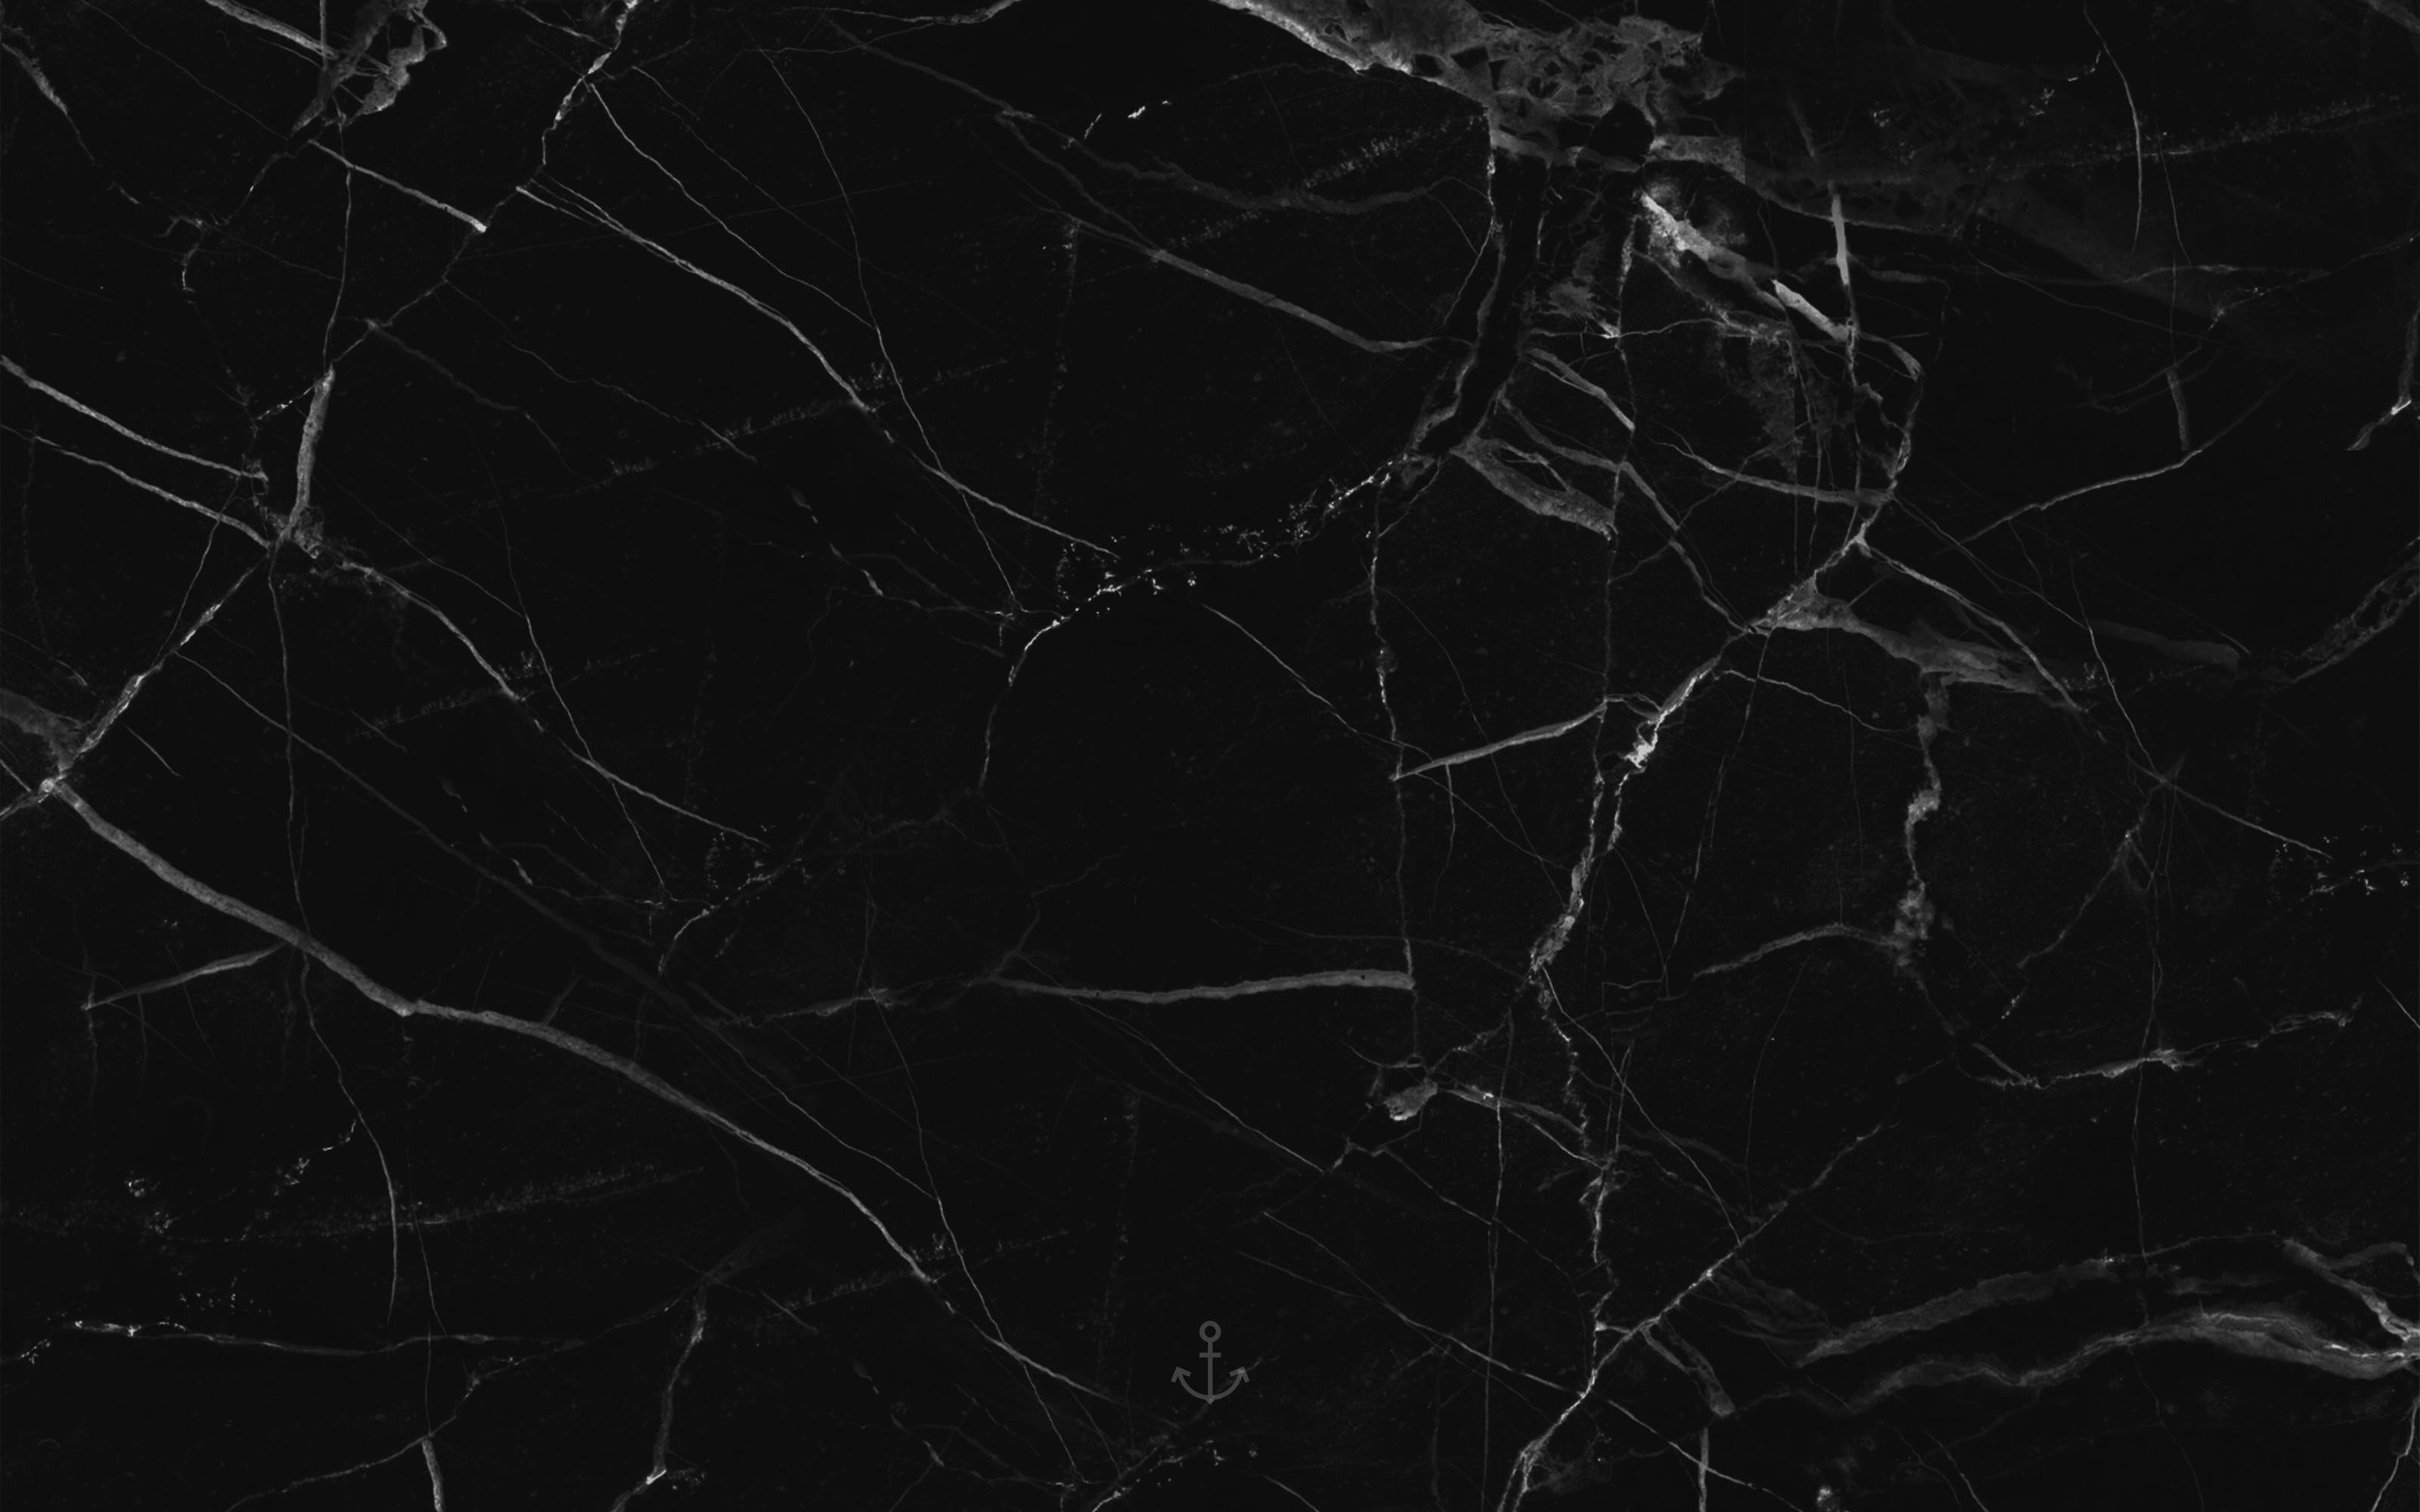 Unduh 100+ Wallpaper Black For Laptop